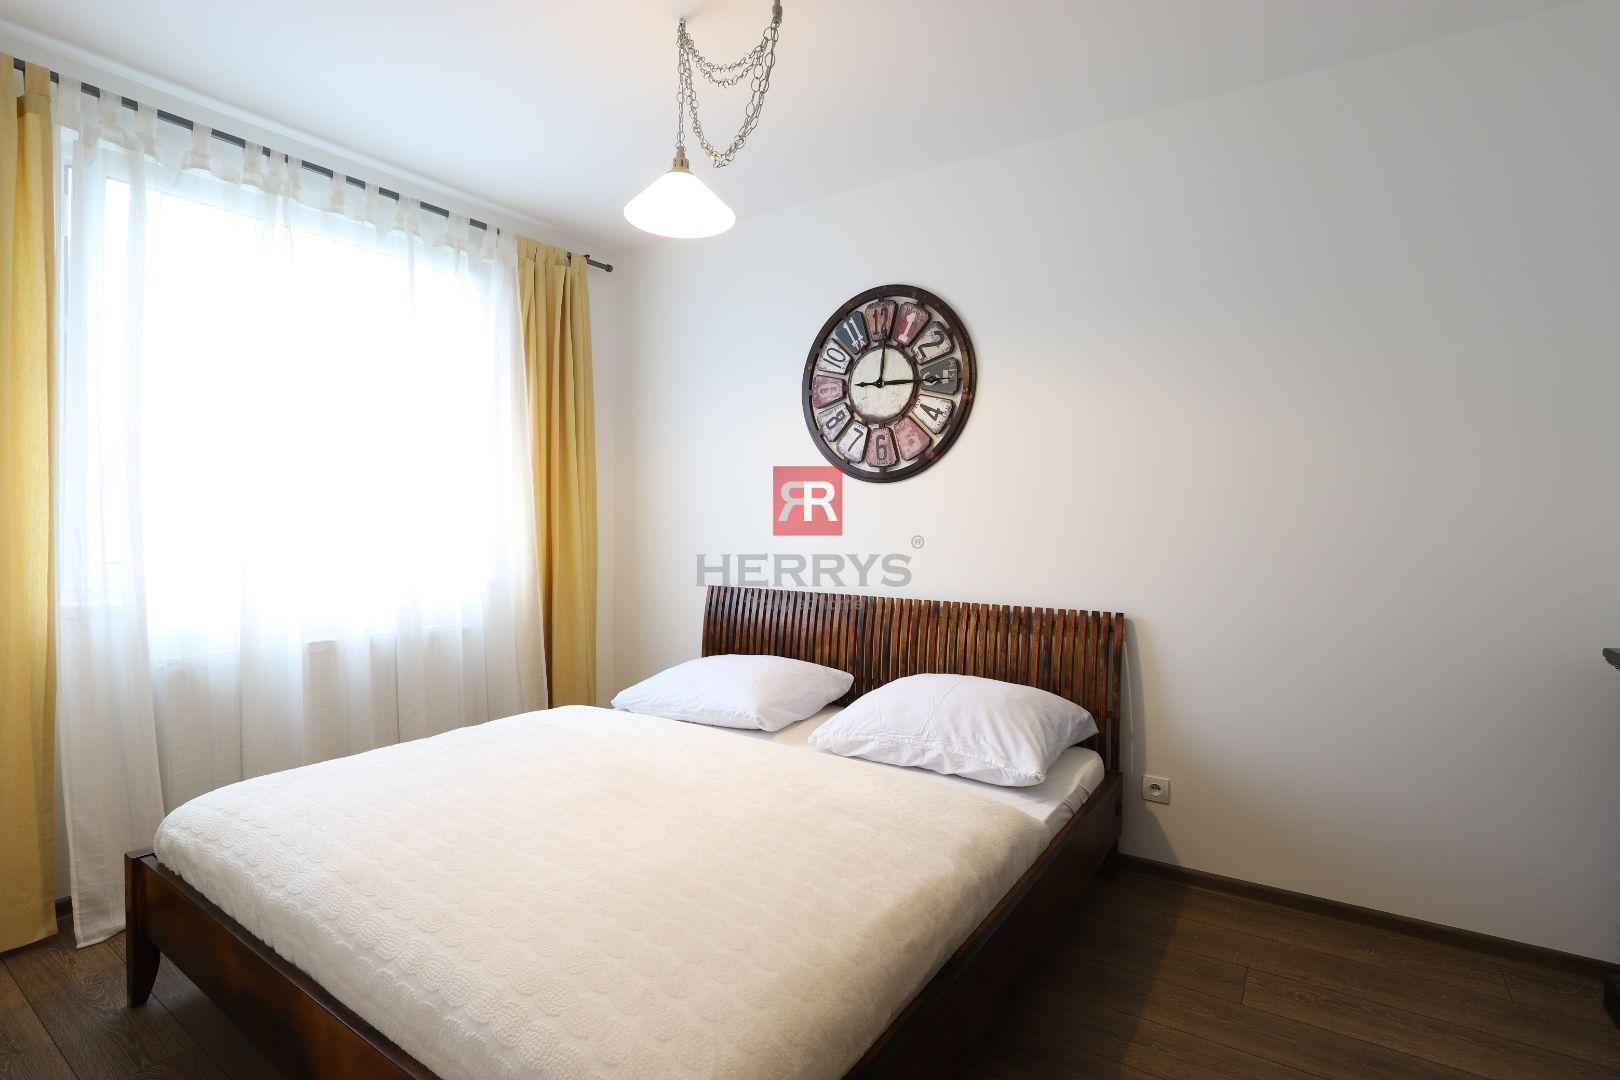 HERRYS - Na prenájom útulný nový 2izb byt s parkovaním v novostavbe na Kramároch